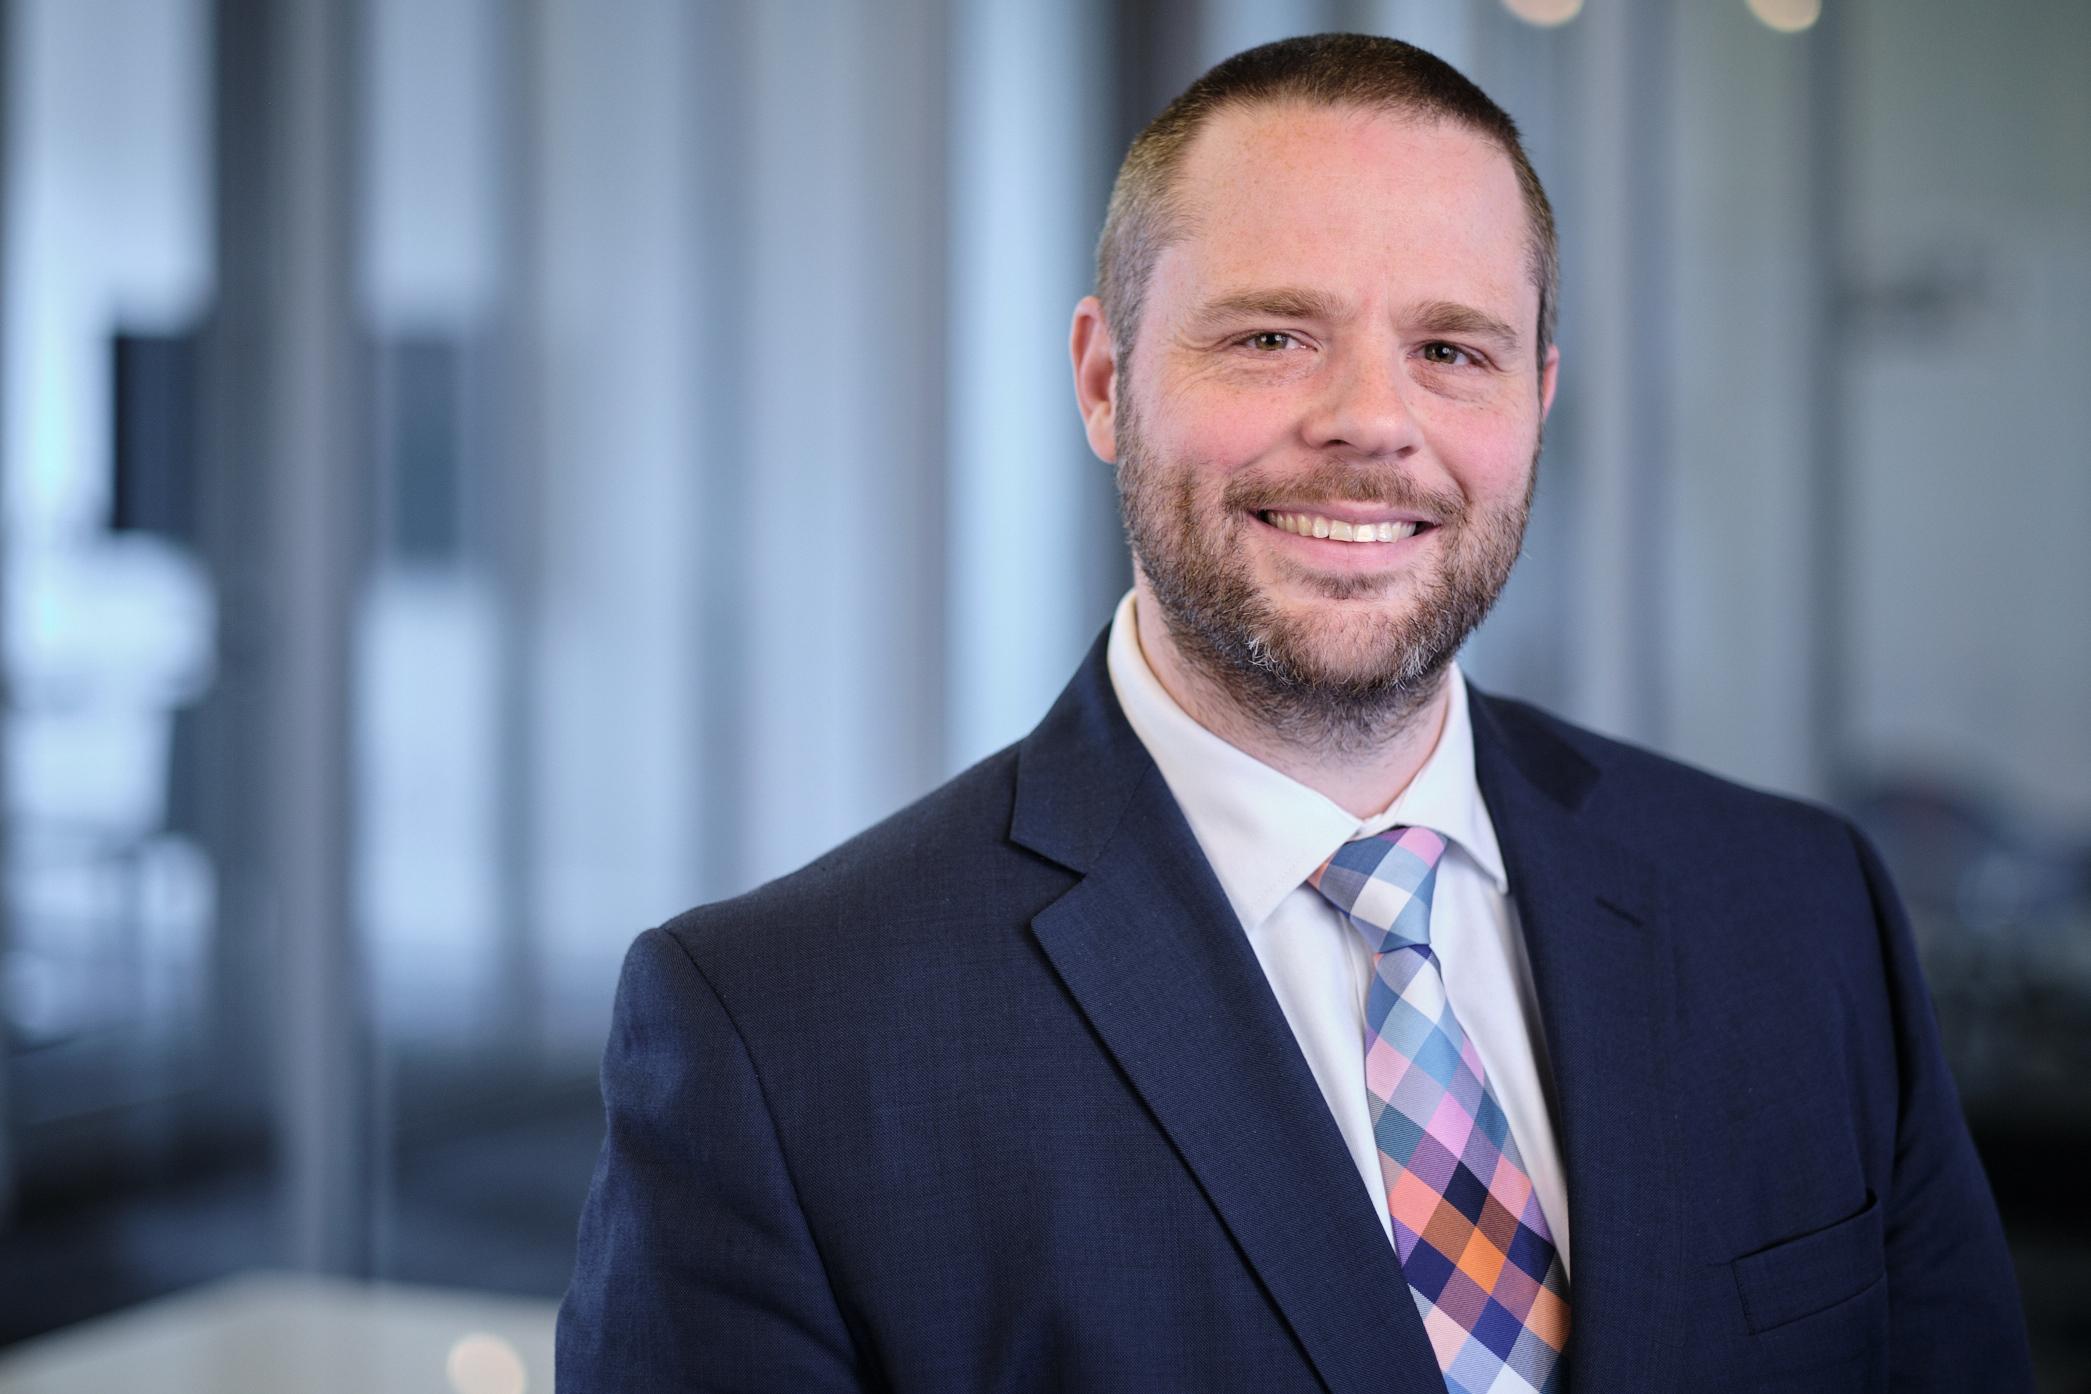 Kevin Wyrsch AIA , Principal